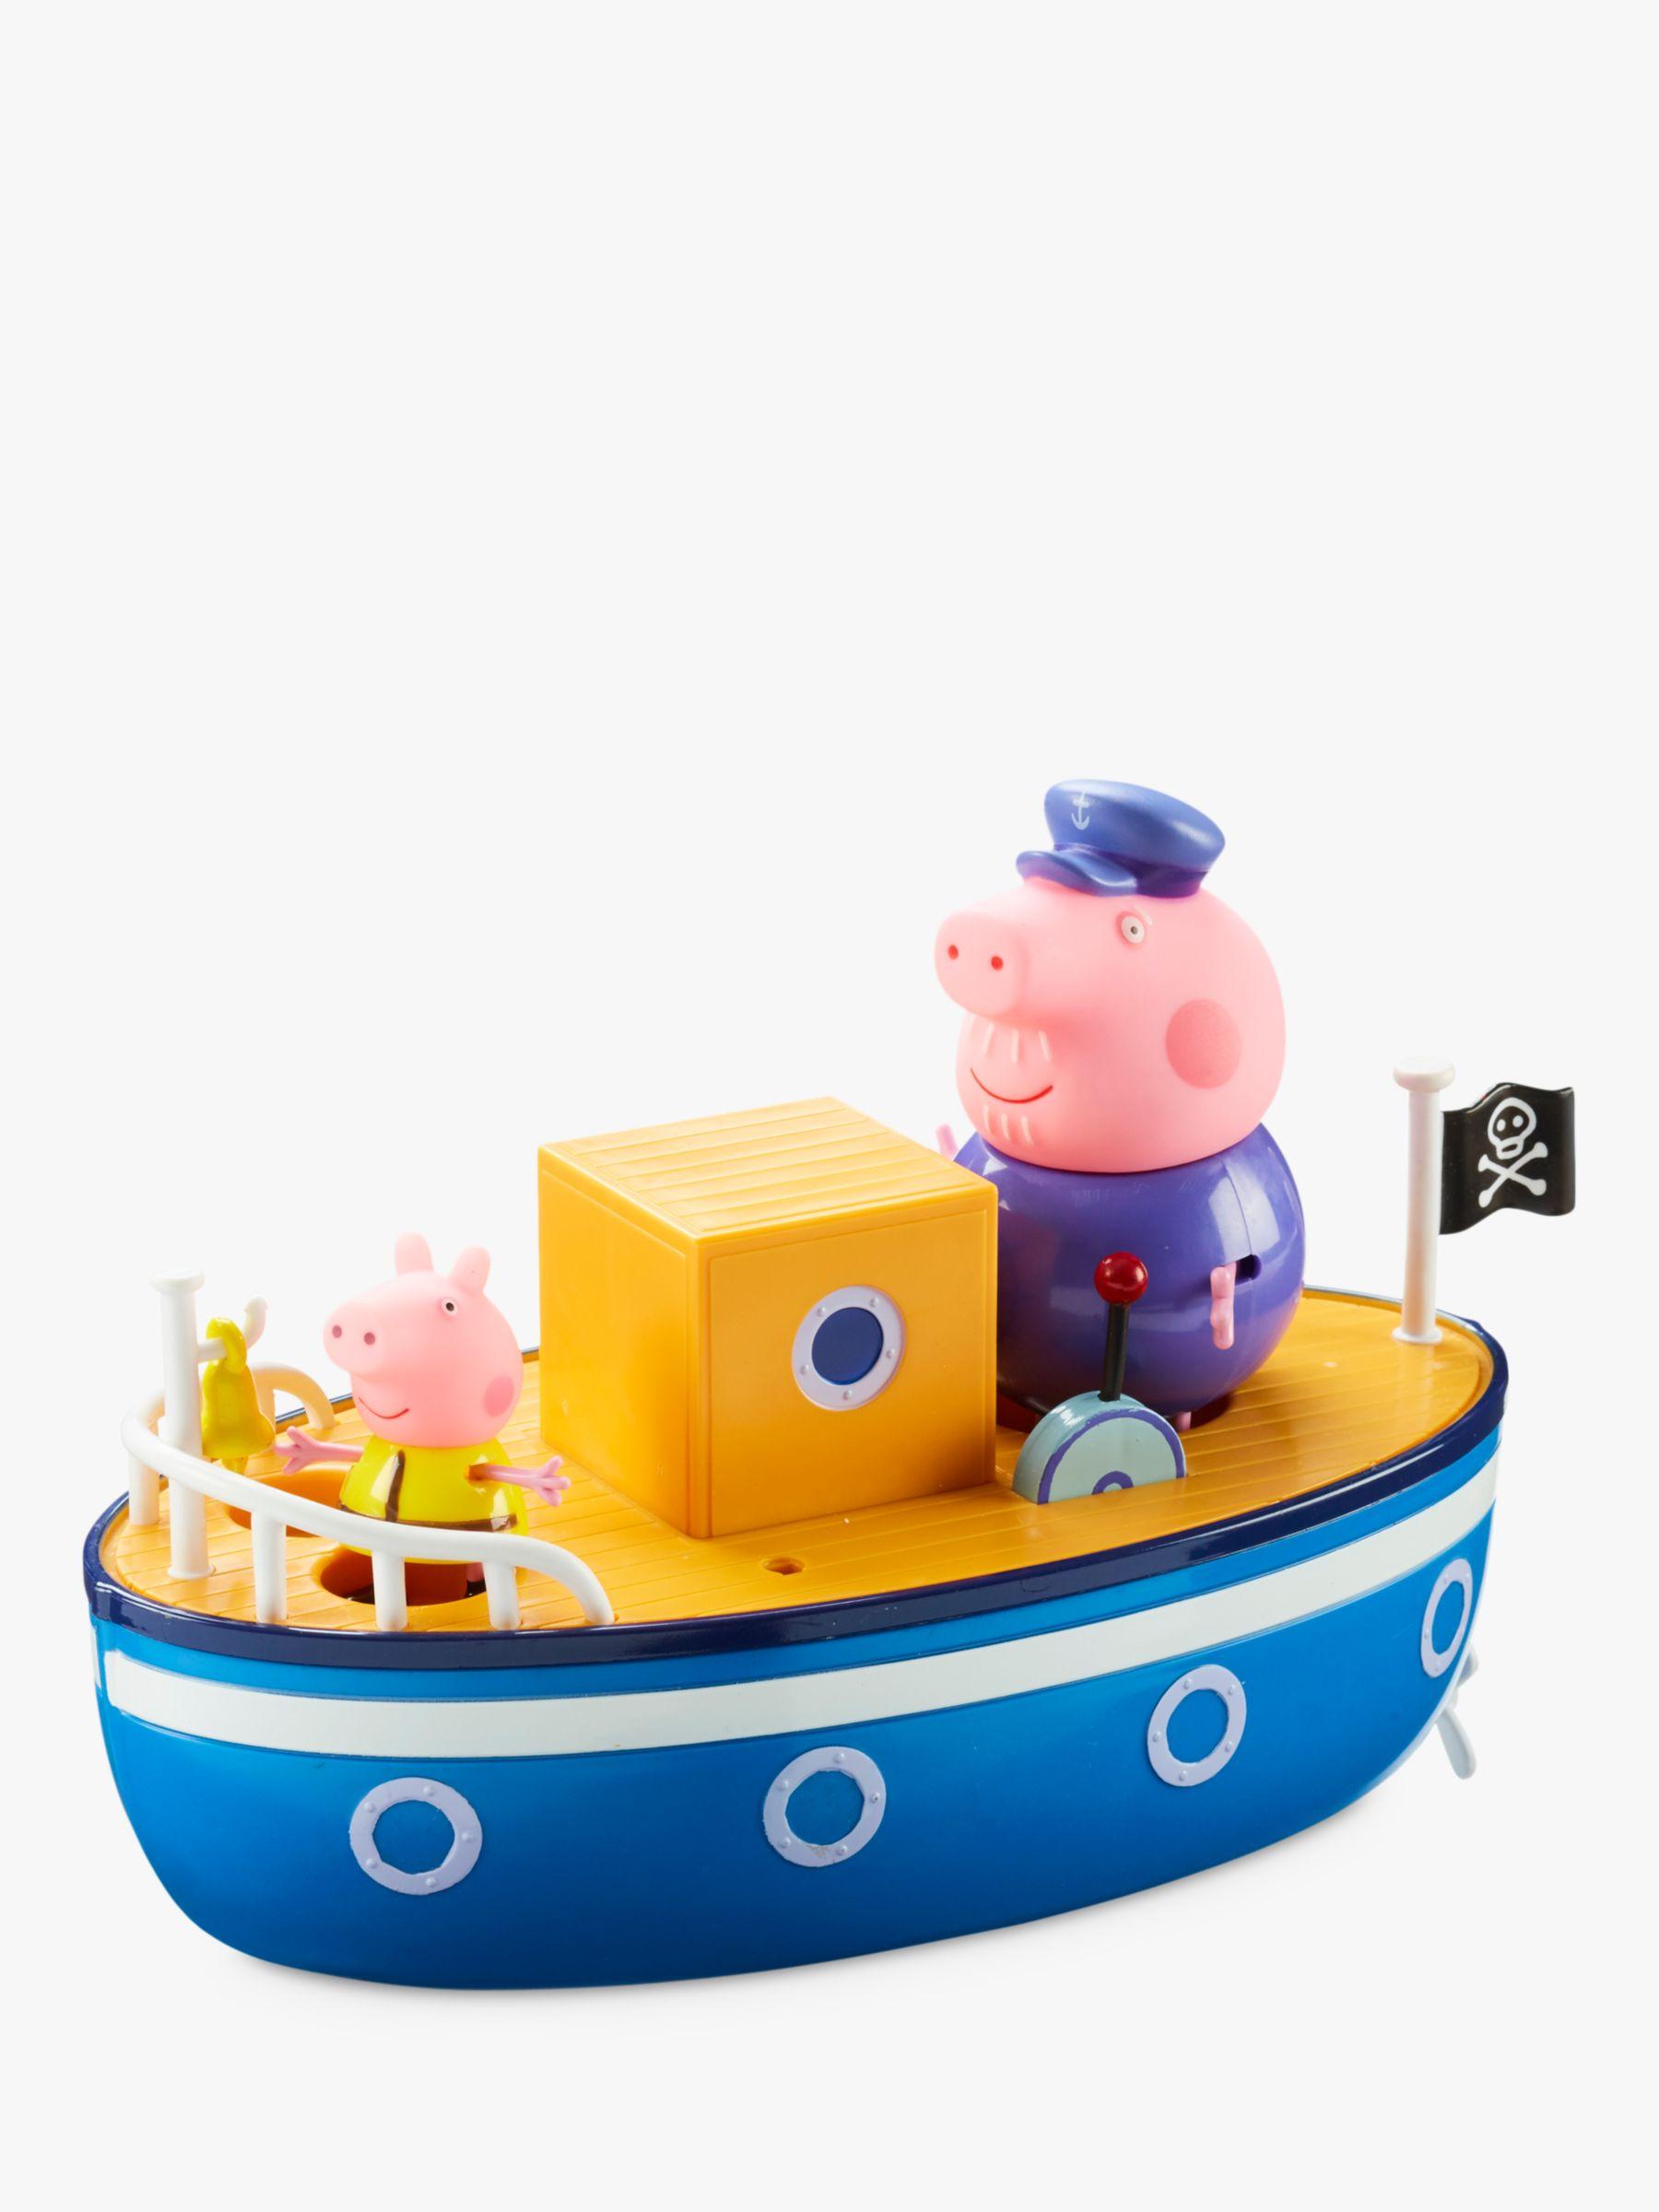 Peppa Pig Peppa Pig Grandpa Pig Bath Boat